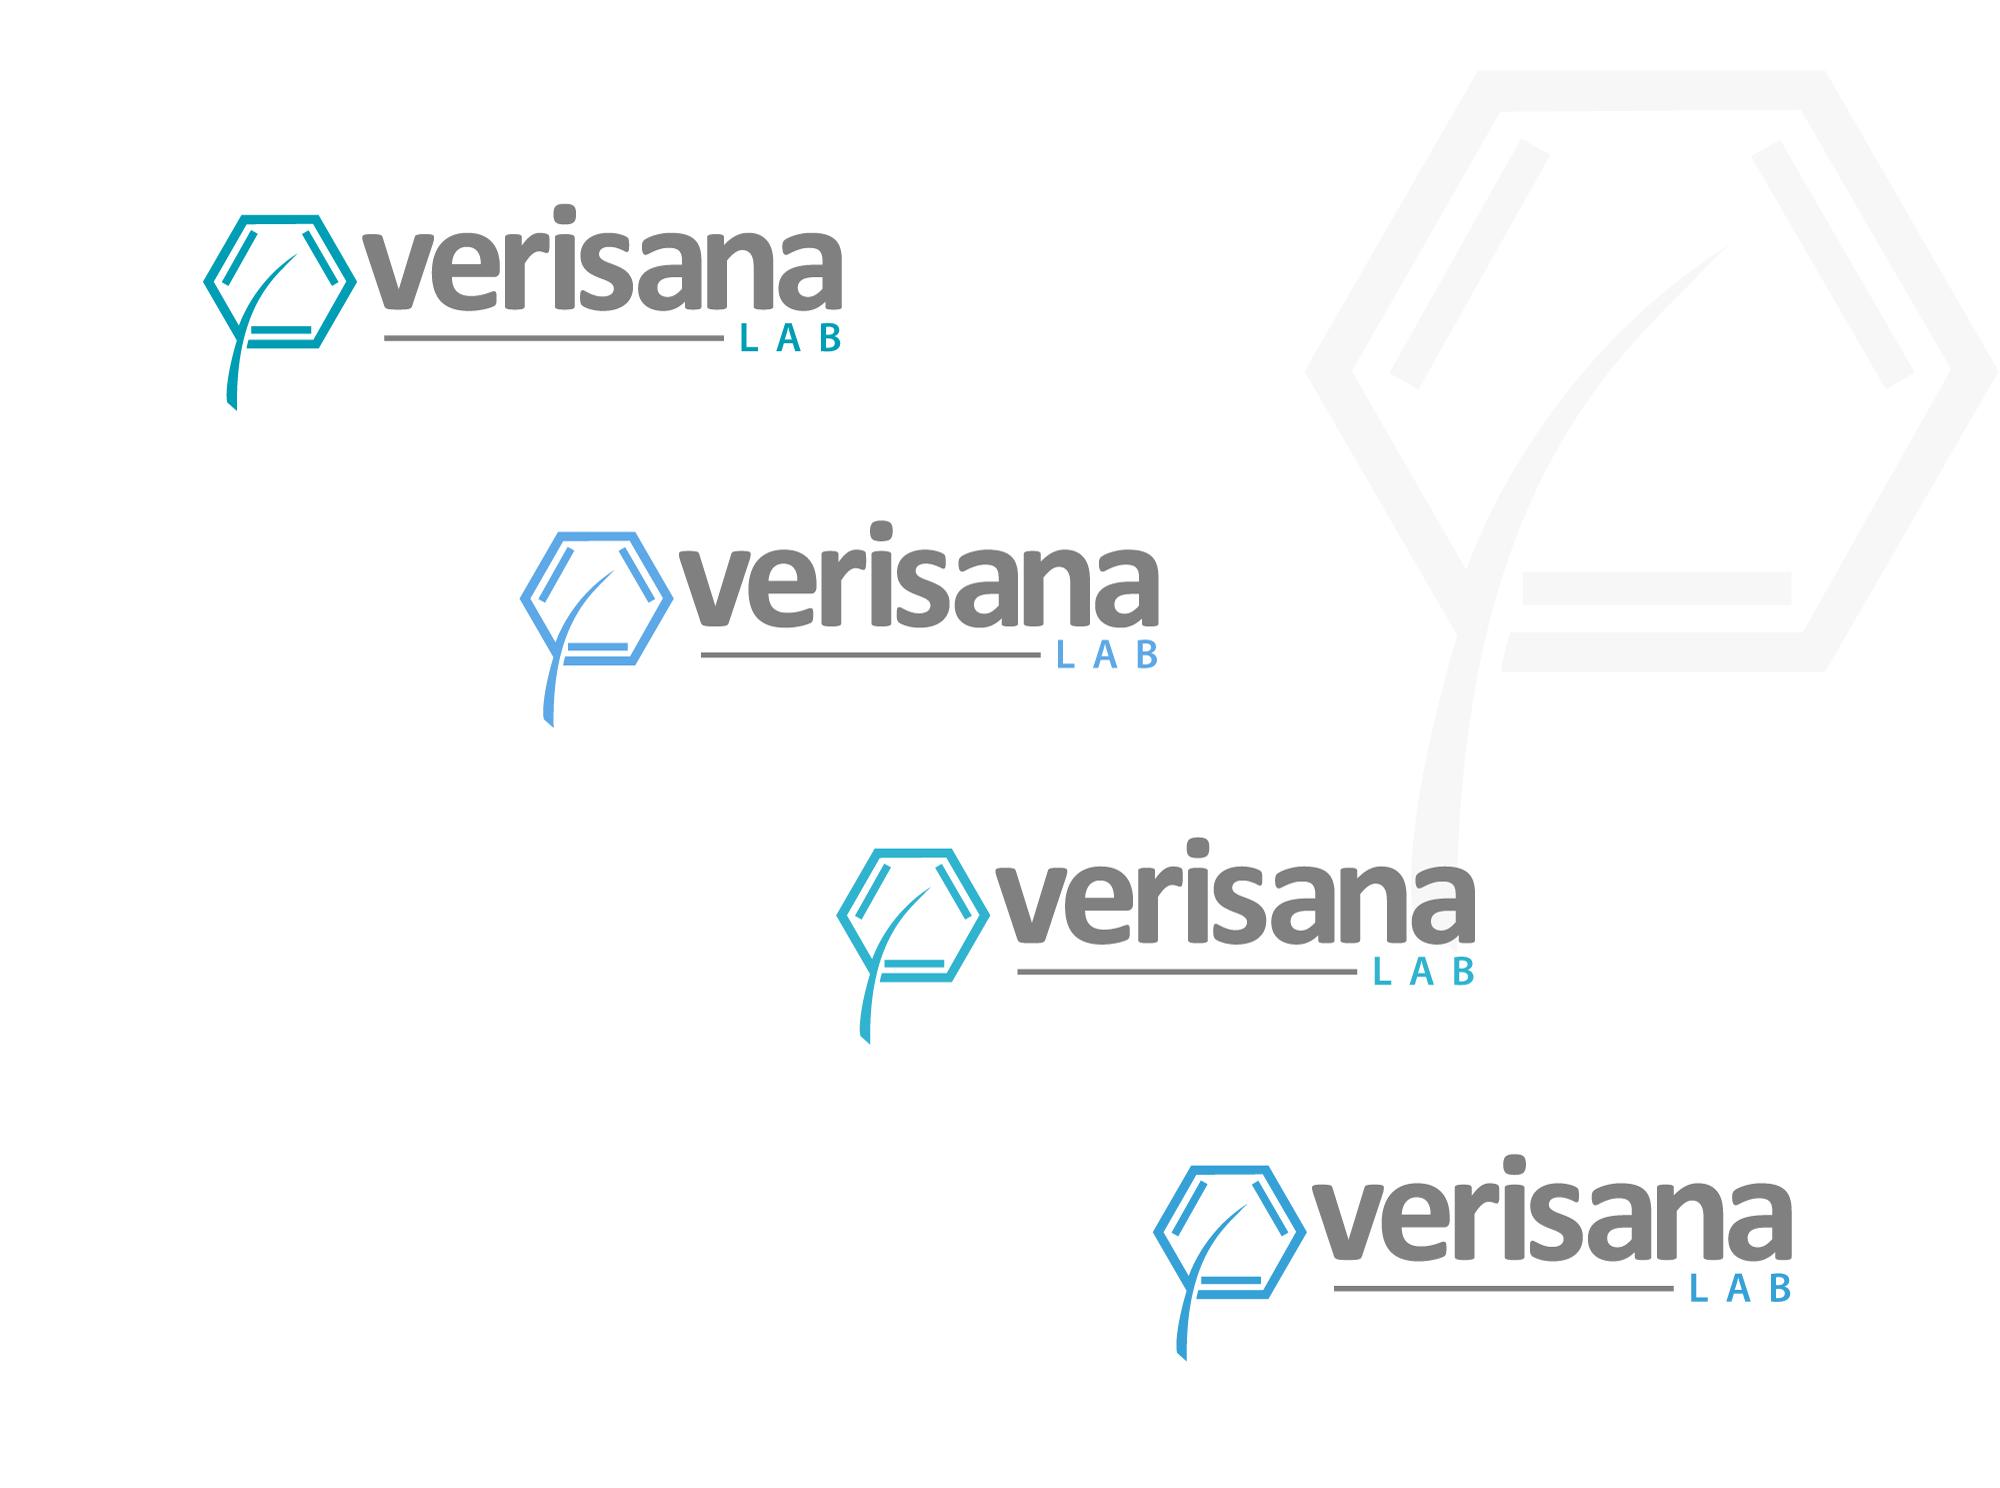 Help Verisana Labs with a new logo